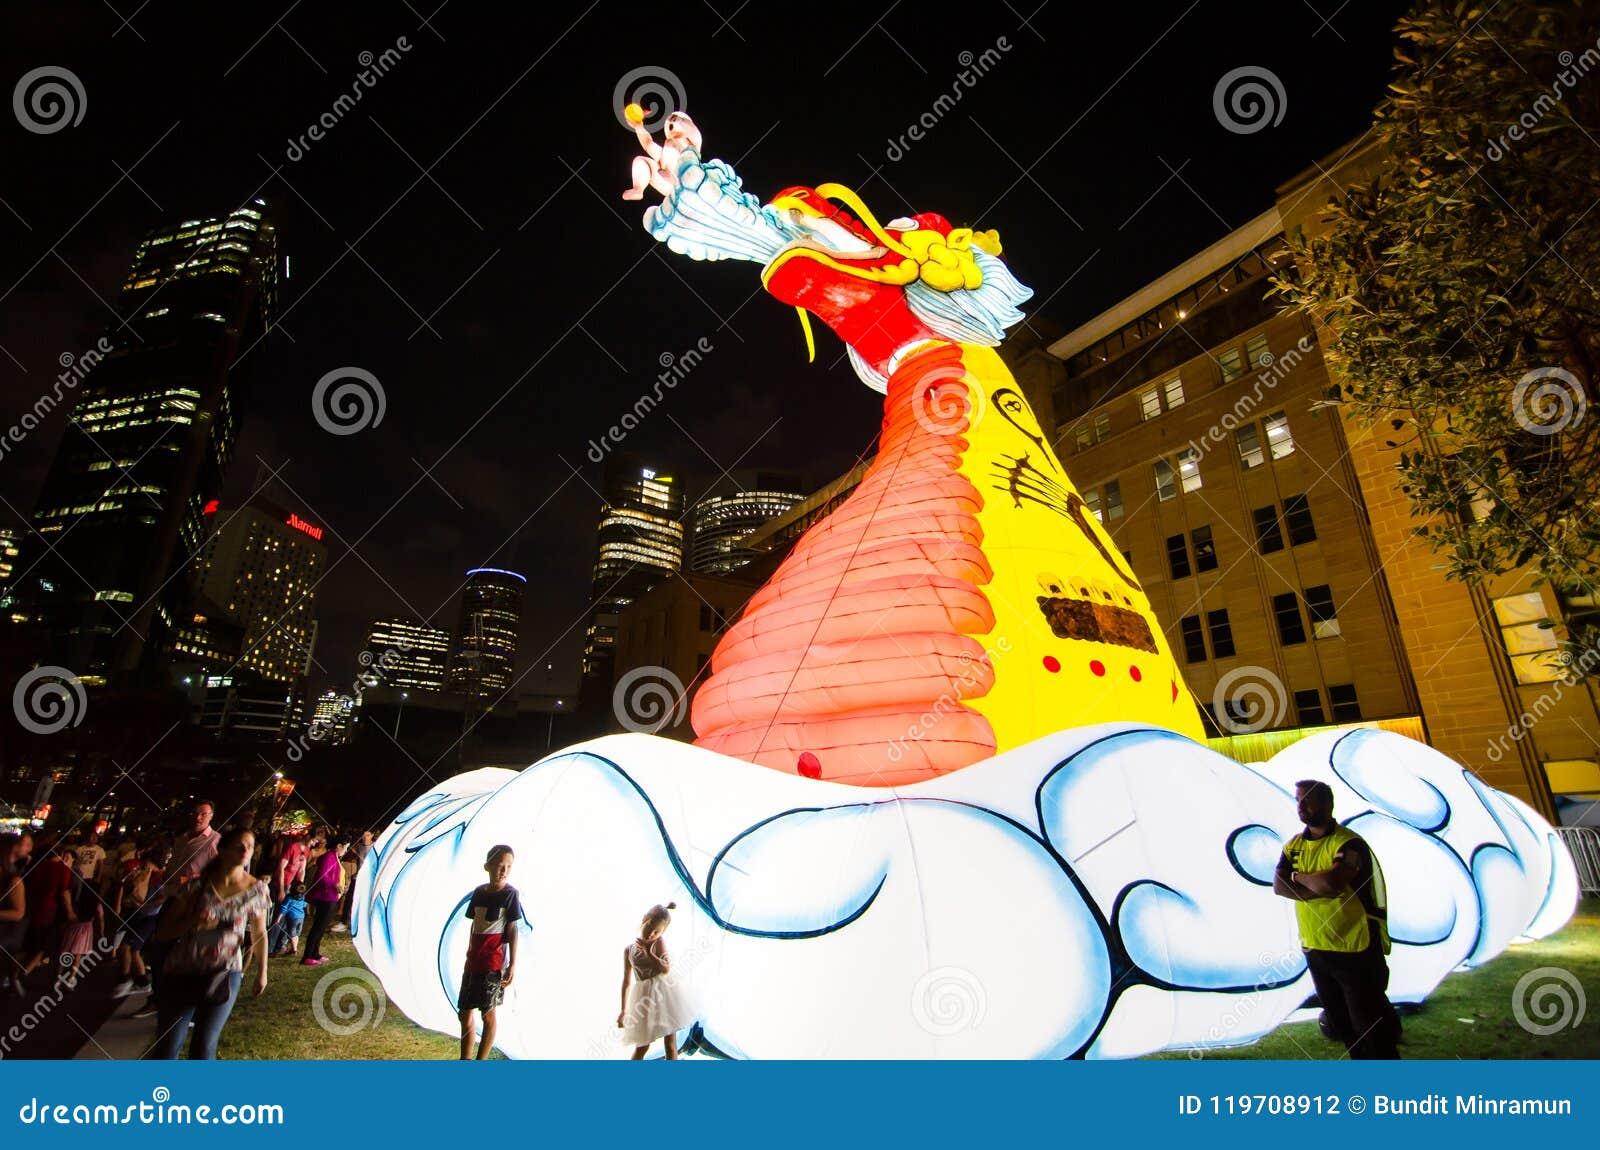 Lunar Lantern `The mystical Dragon` is zodiac symbol of Dragon will be illuminated from dusk at Circular Quay by Artist Guan Wei.